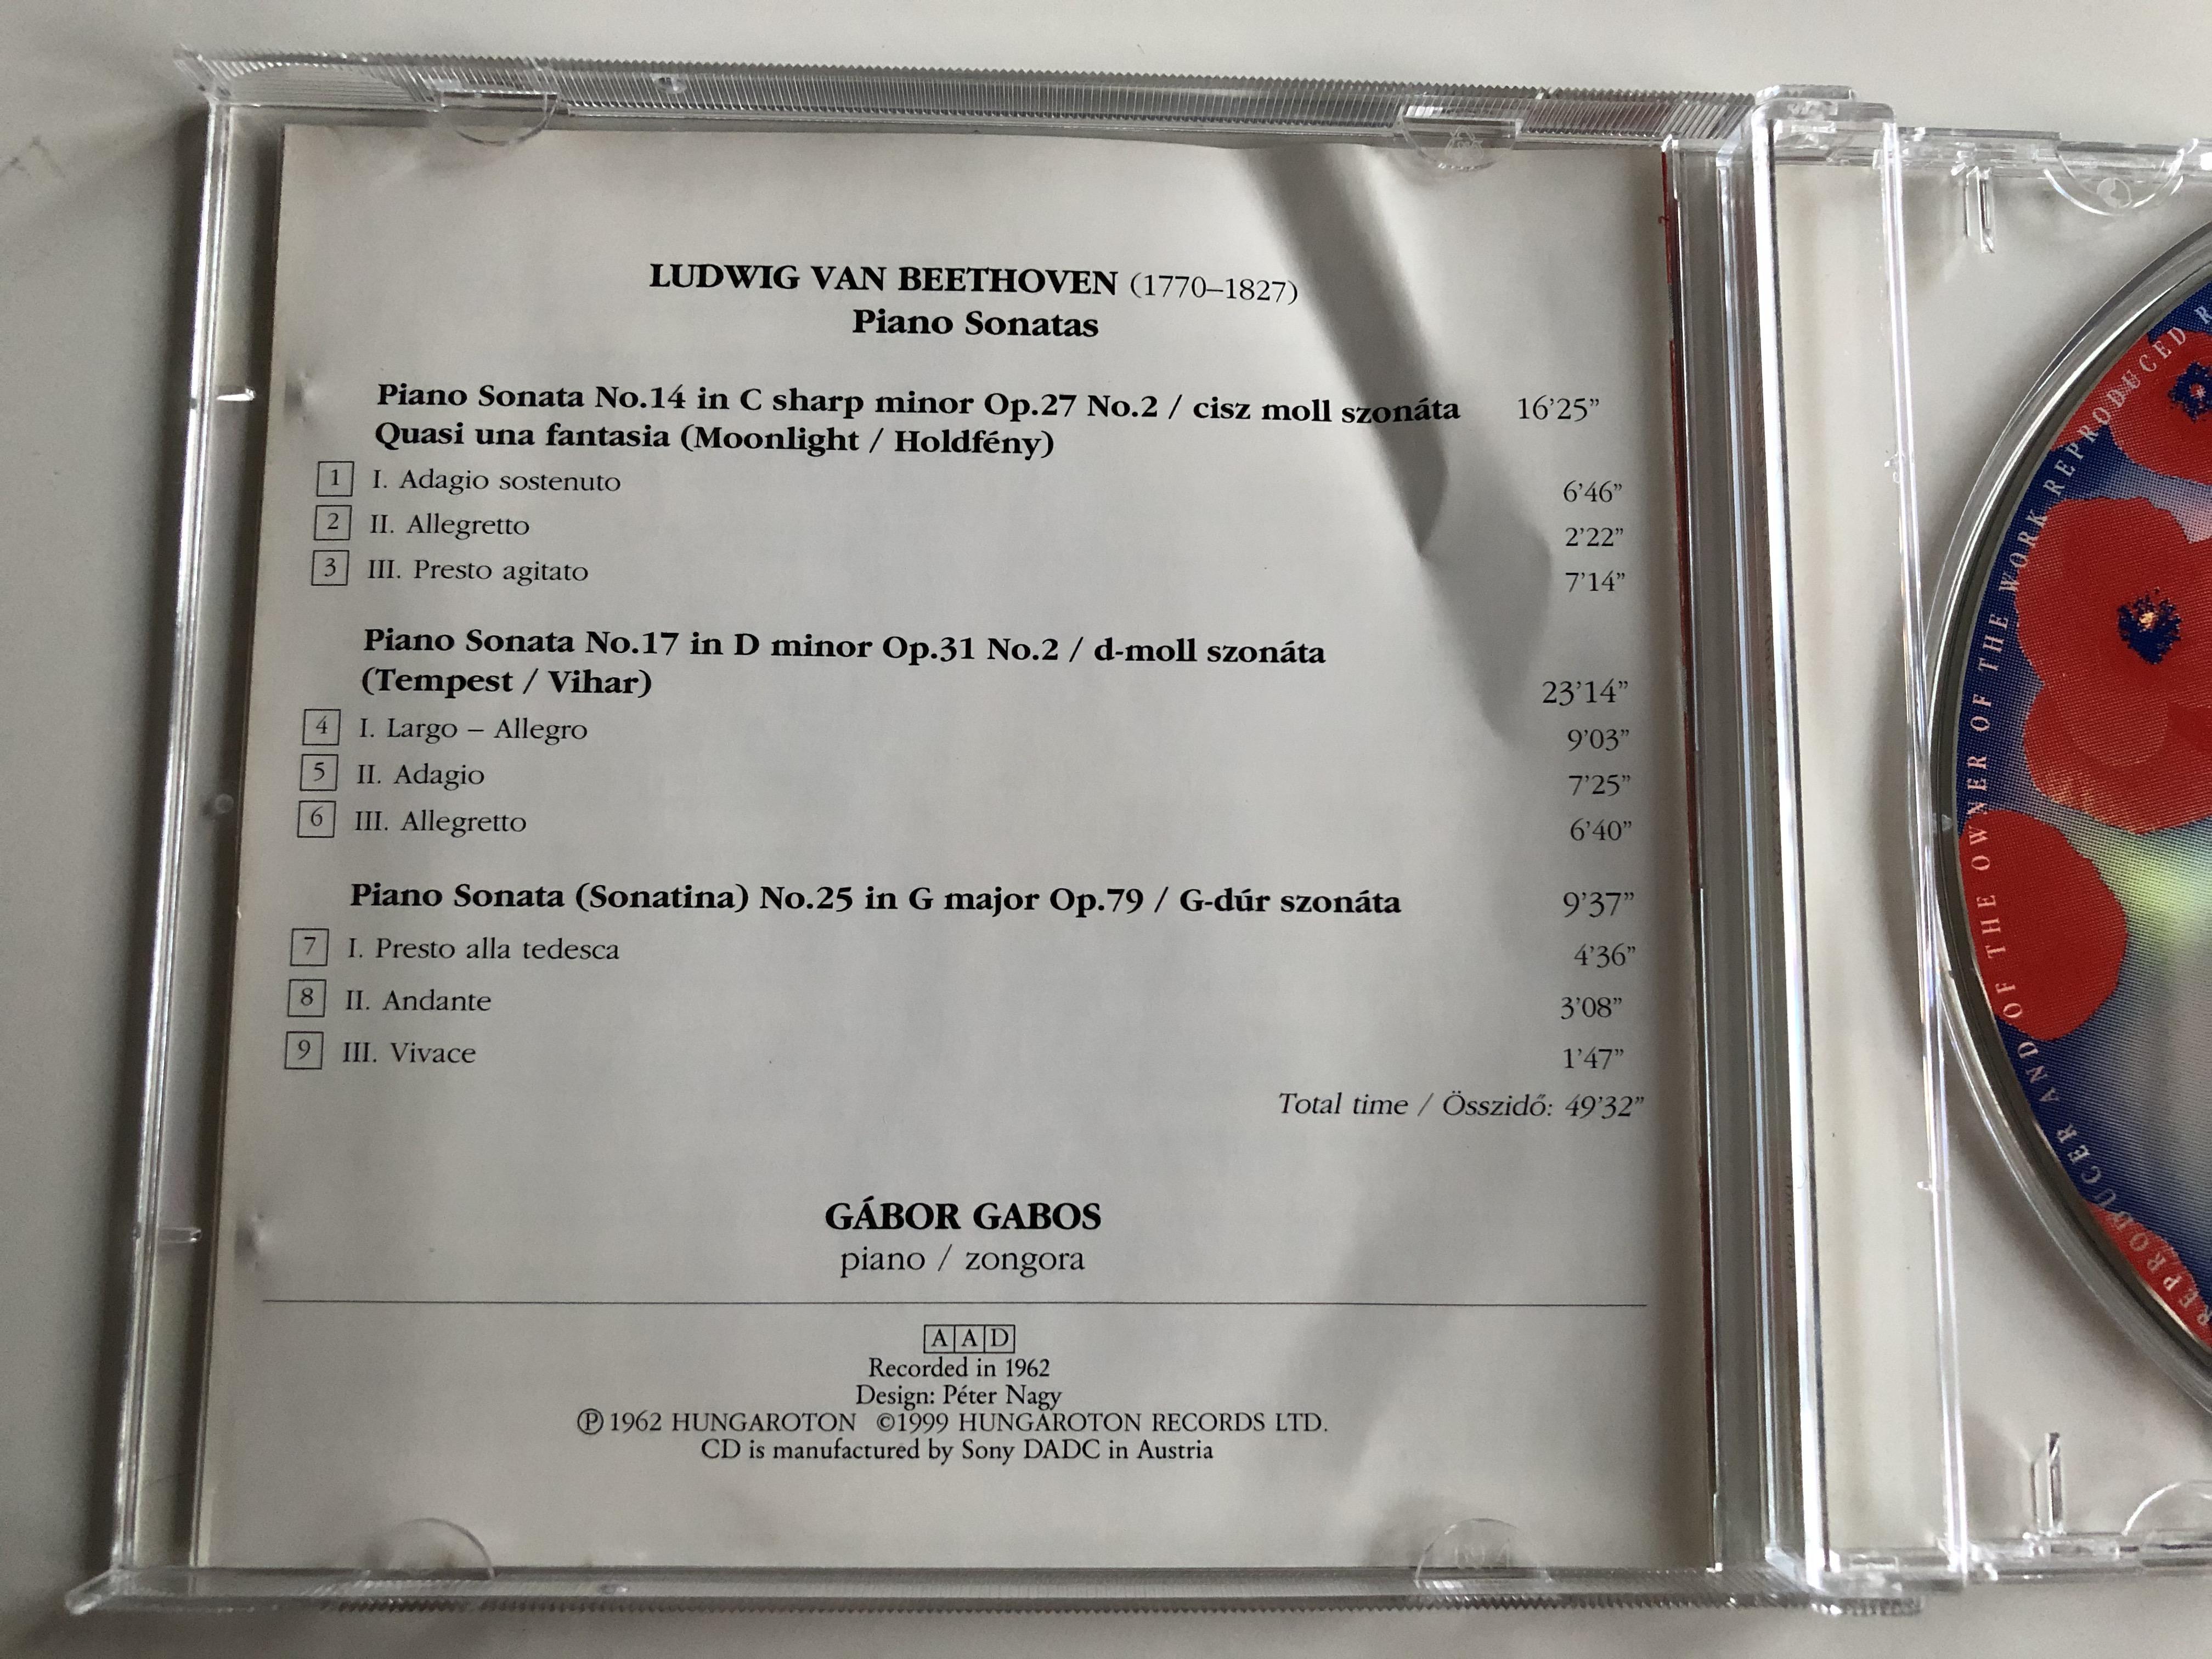 beethoven-piano-sonatas-moonlight-op.-272-tempest-op.-312-g-major-op.79-g-bor-gabos-hungaroton-classic-audio-cd-1962-stereo-hrc-1007-2-.jpg